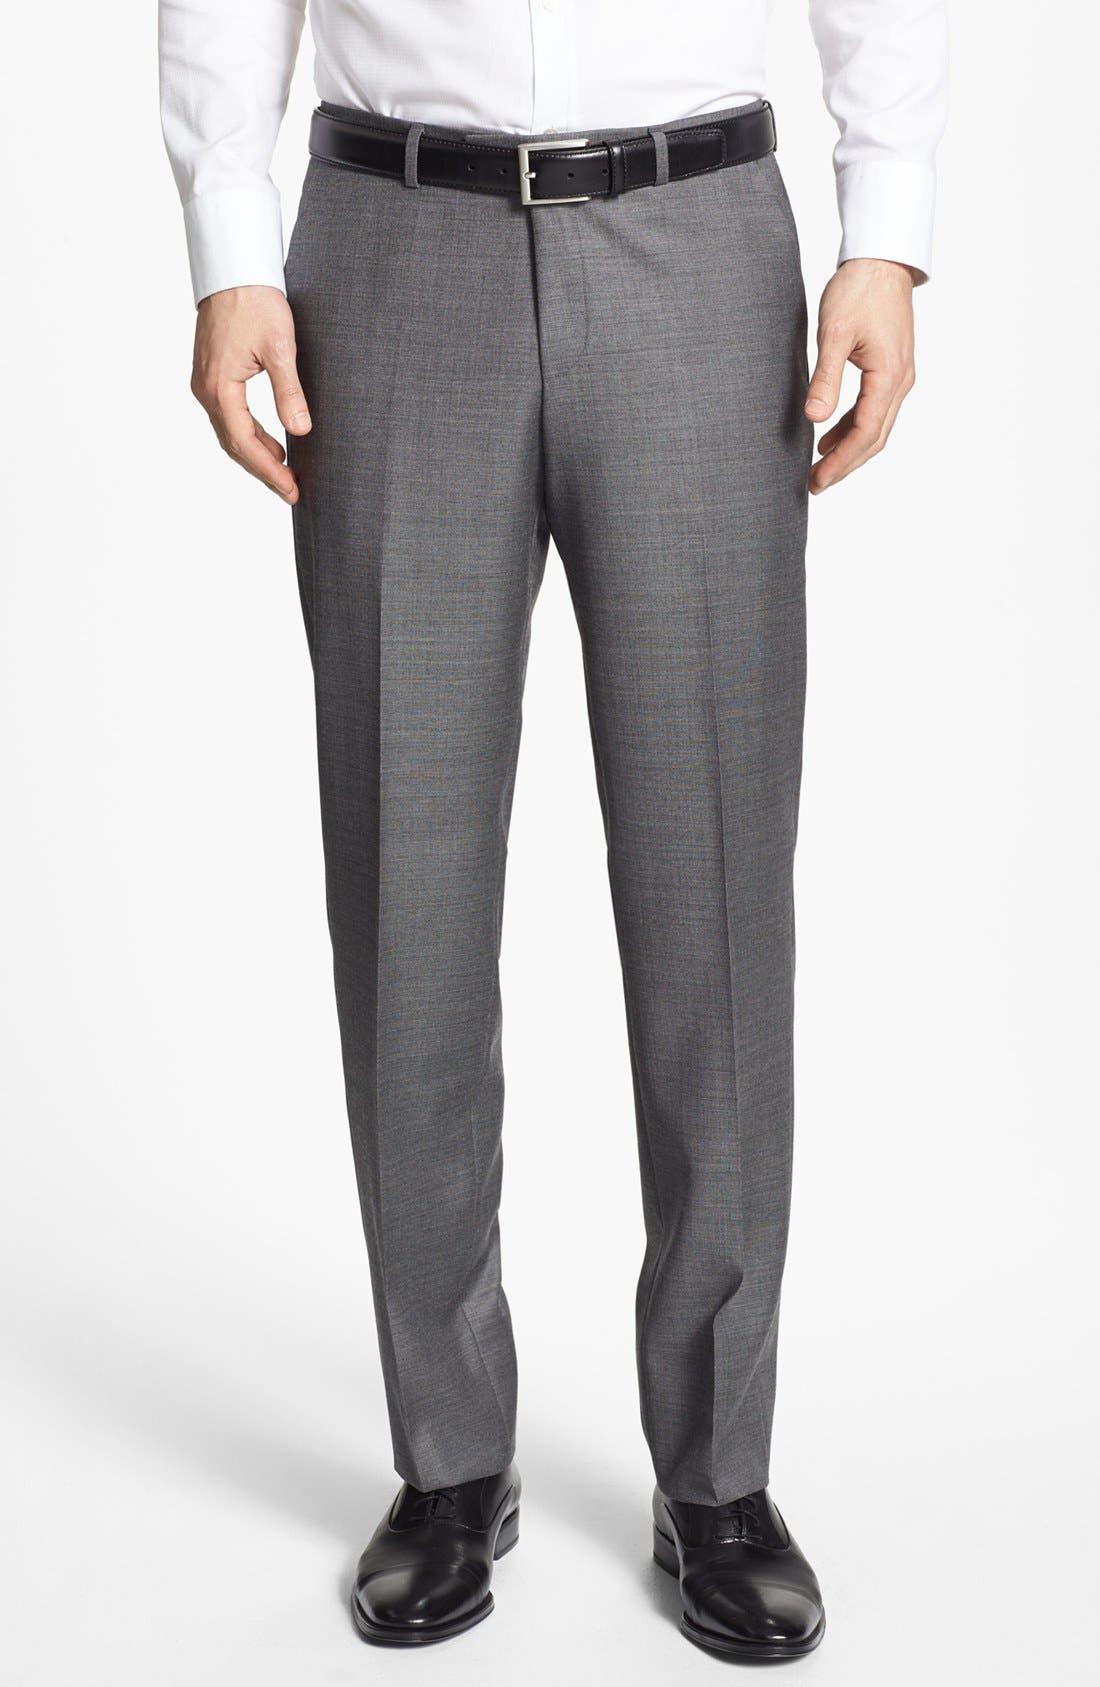 ZZDNUHUGO BOSS BOSS HUGO BOSS 'Sharp' Flat Front Wool Trousers, Main, color, 001